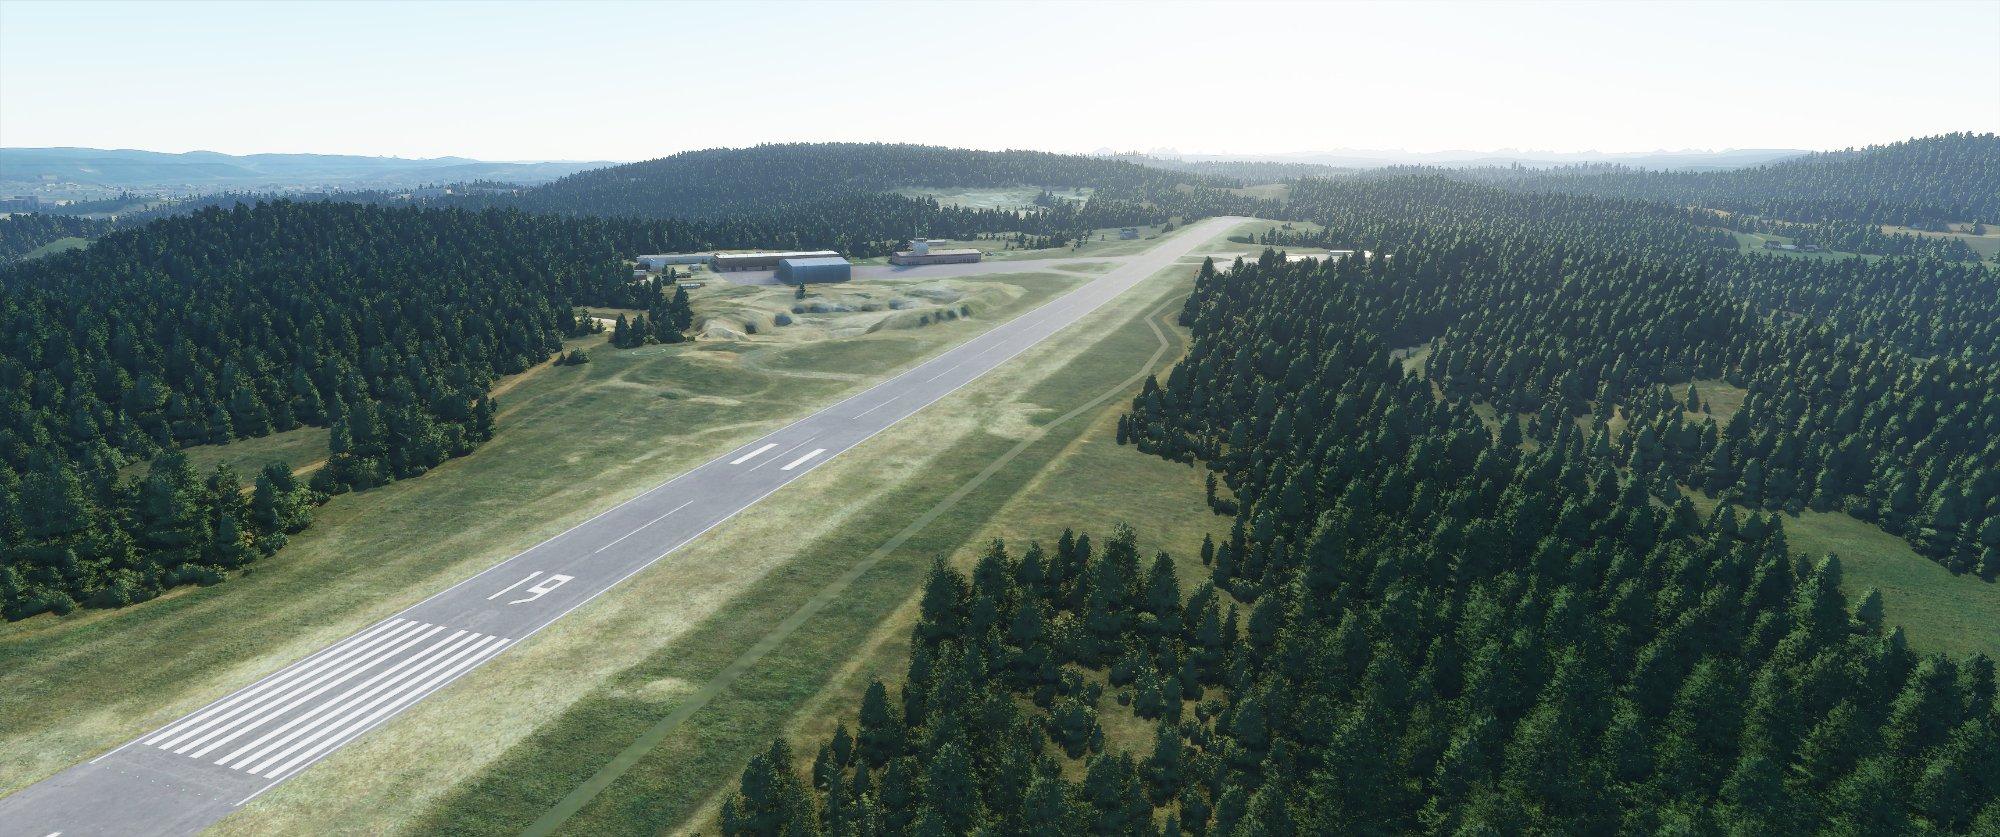 Microsoft Flight Simulator Screenshot 2020.10.27 - 18.38.33.29.jpg